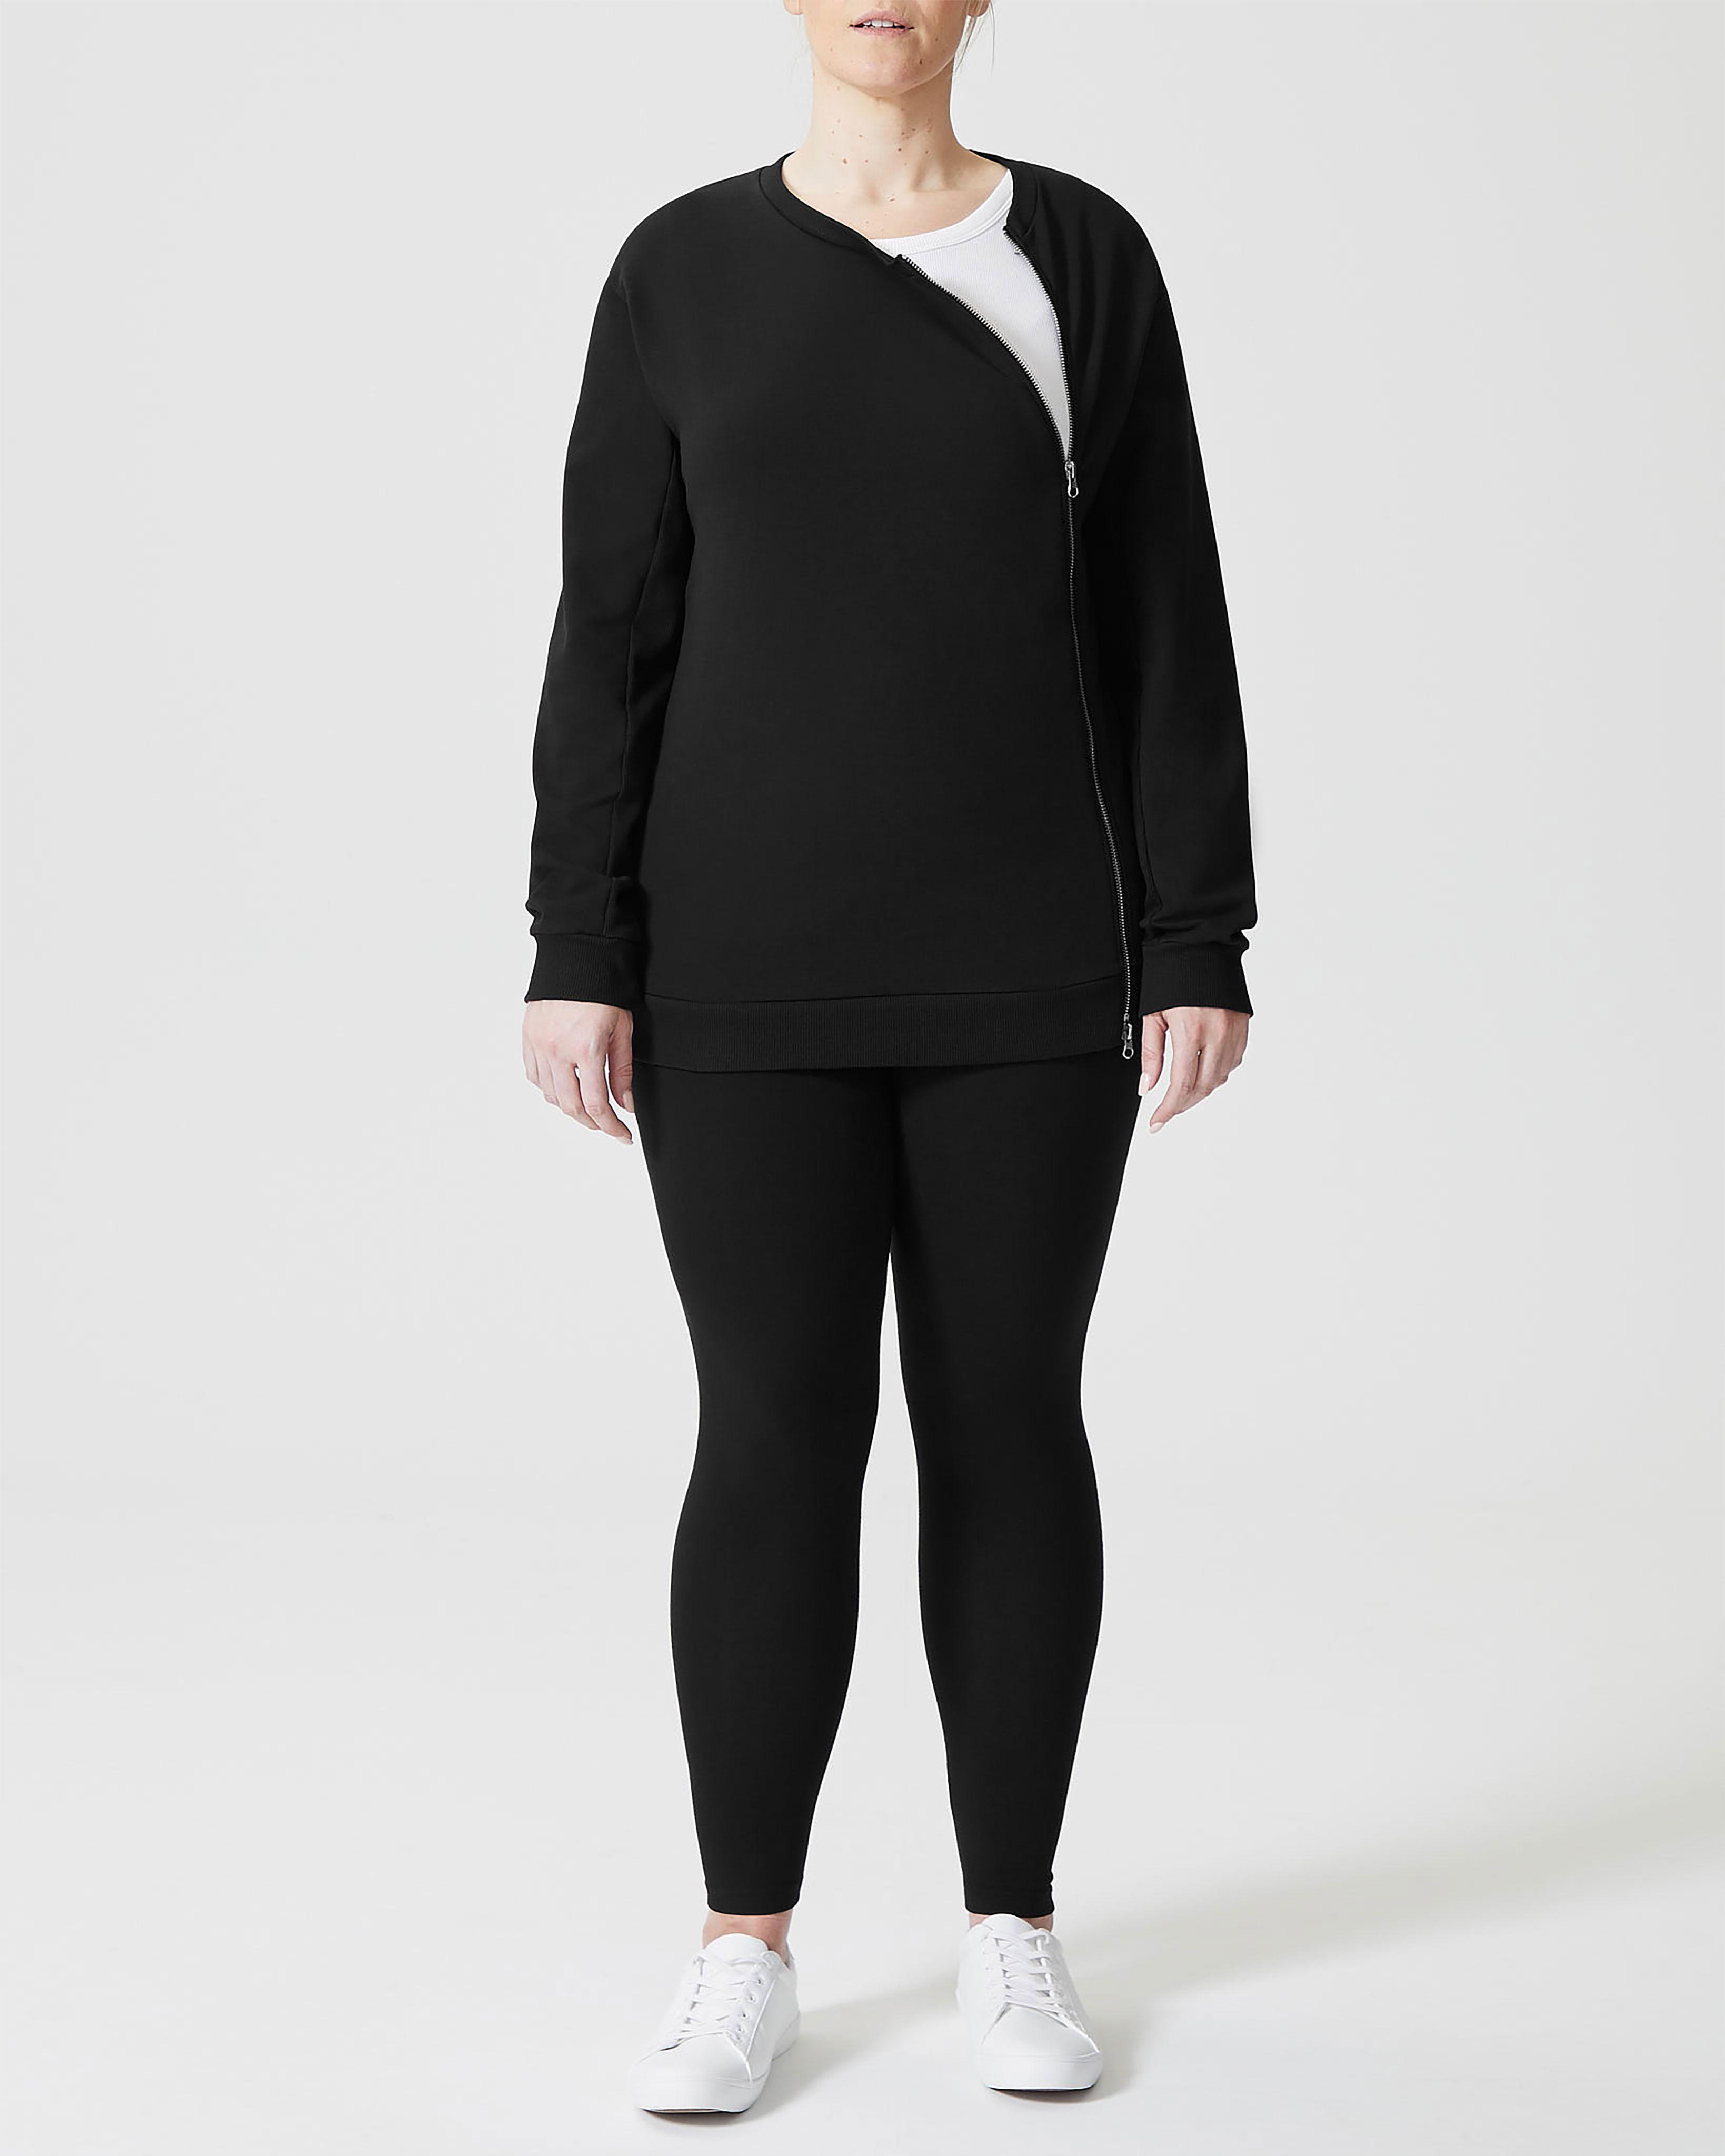 Meridian Zip Pullover - Black